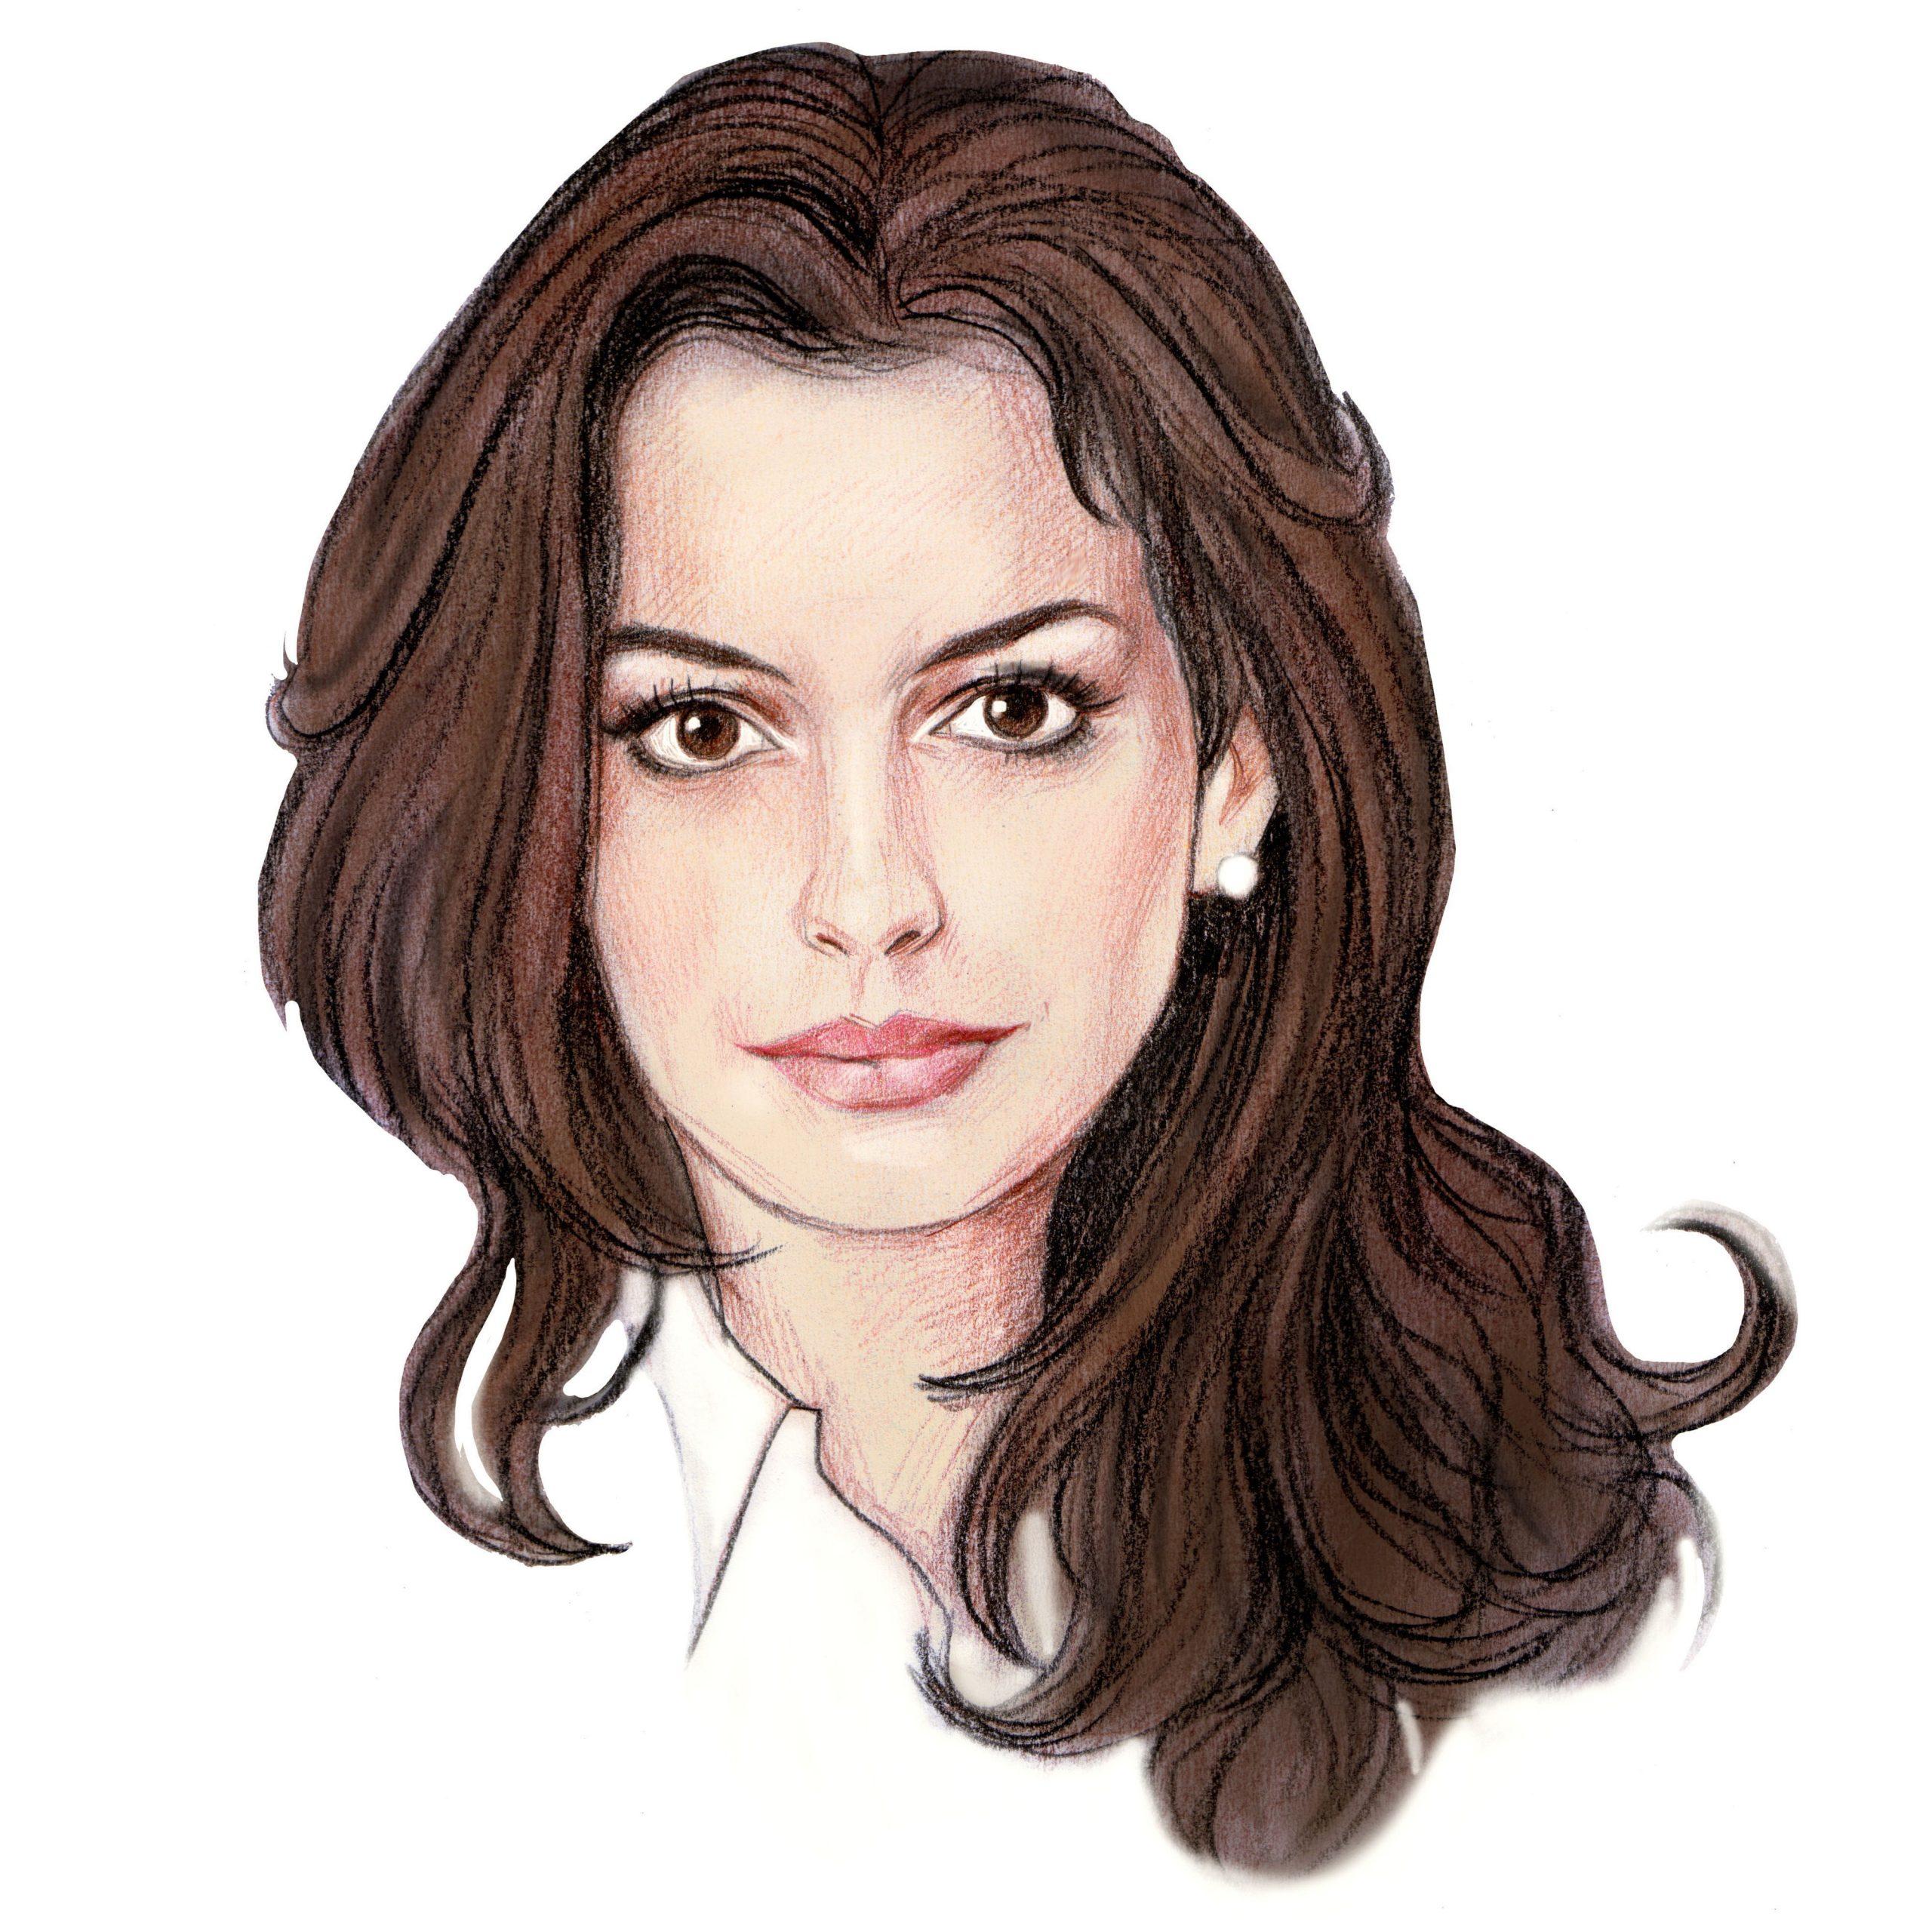 Handgetekend portret van Anne Hathaway